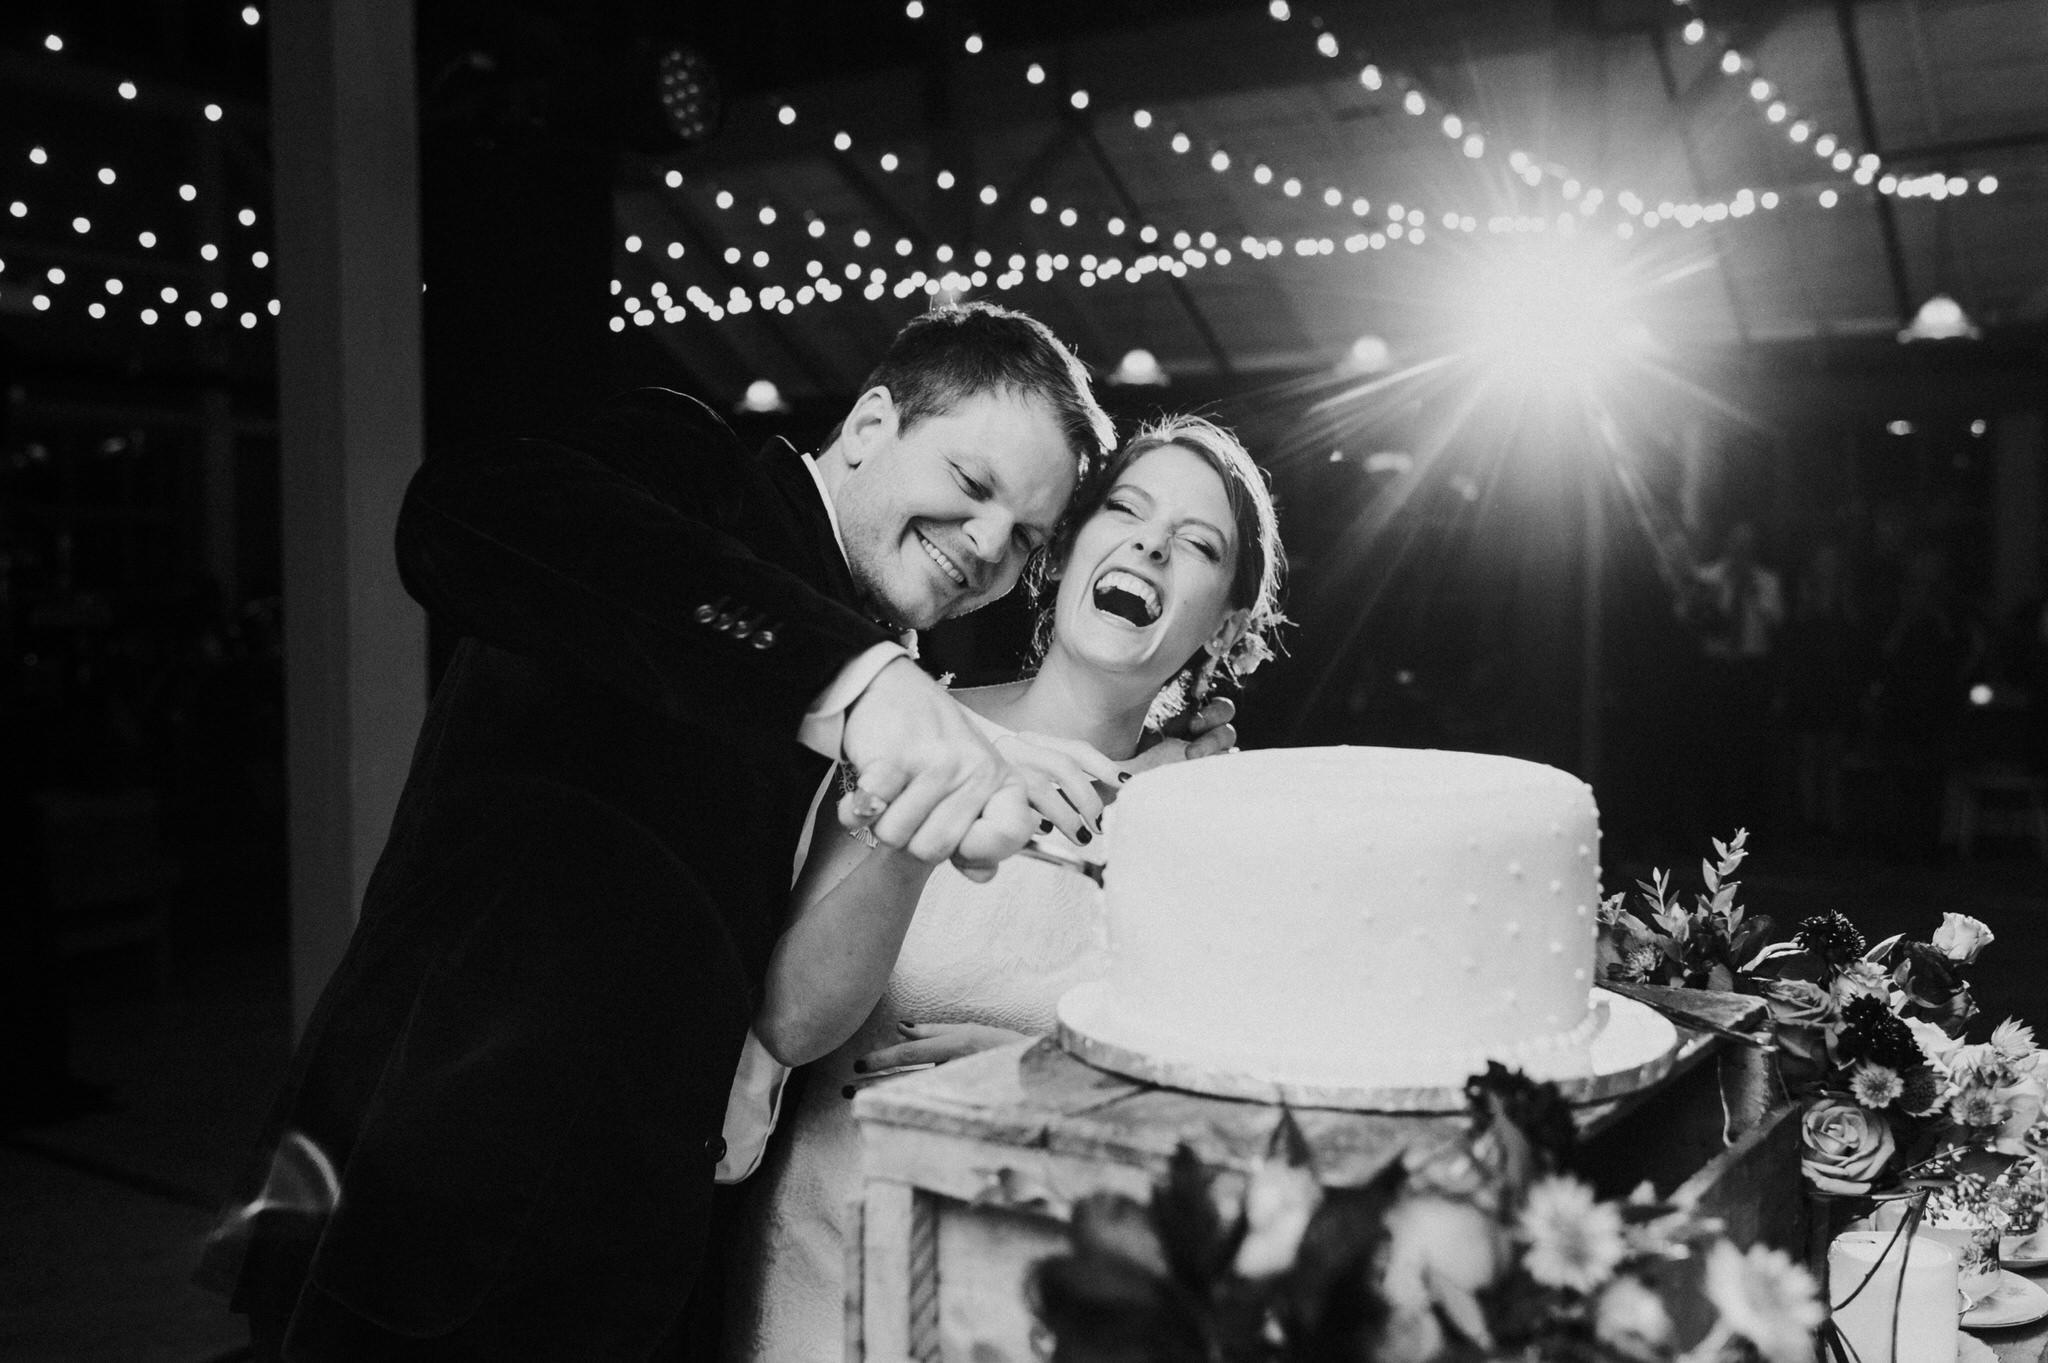 scarletoneillphotography_weddingphotography_prince edward county weddings163.JPG